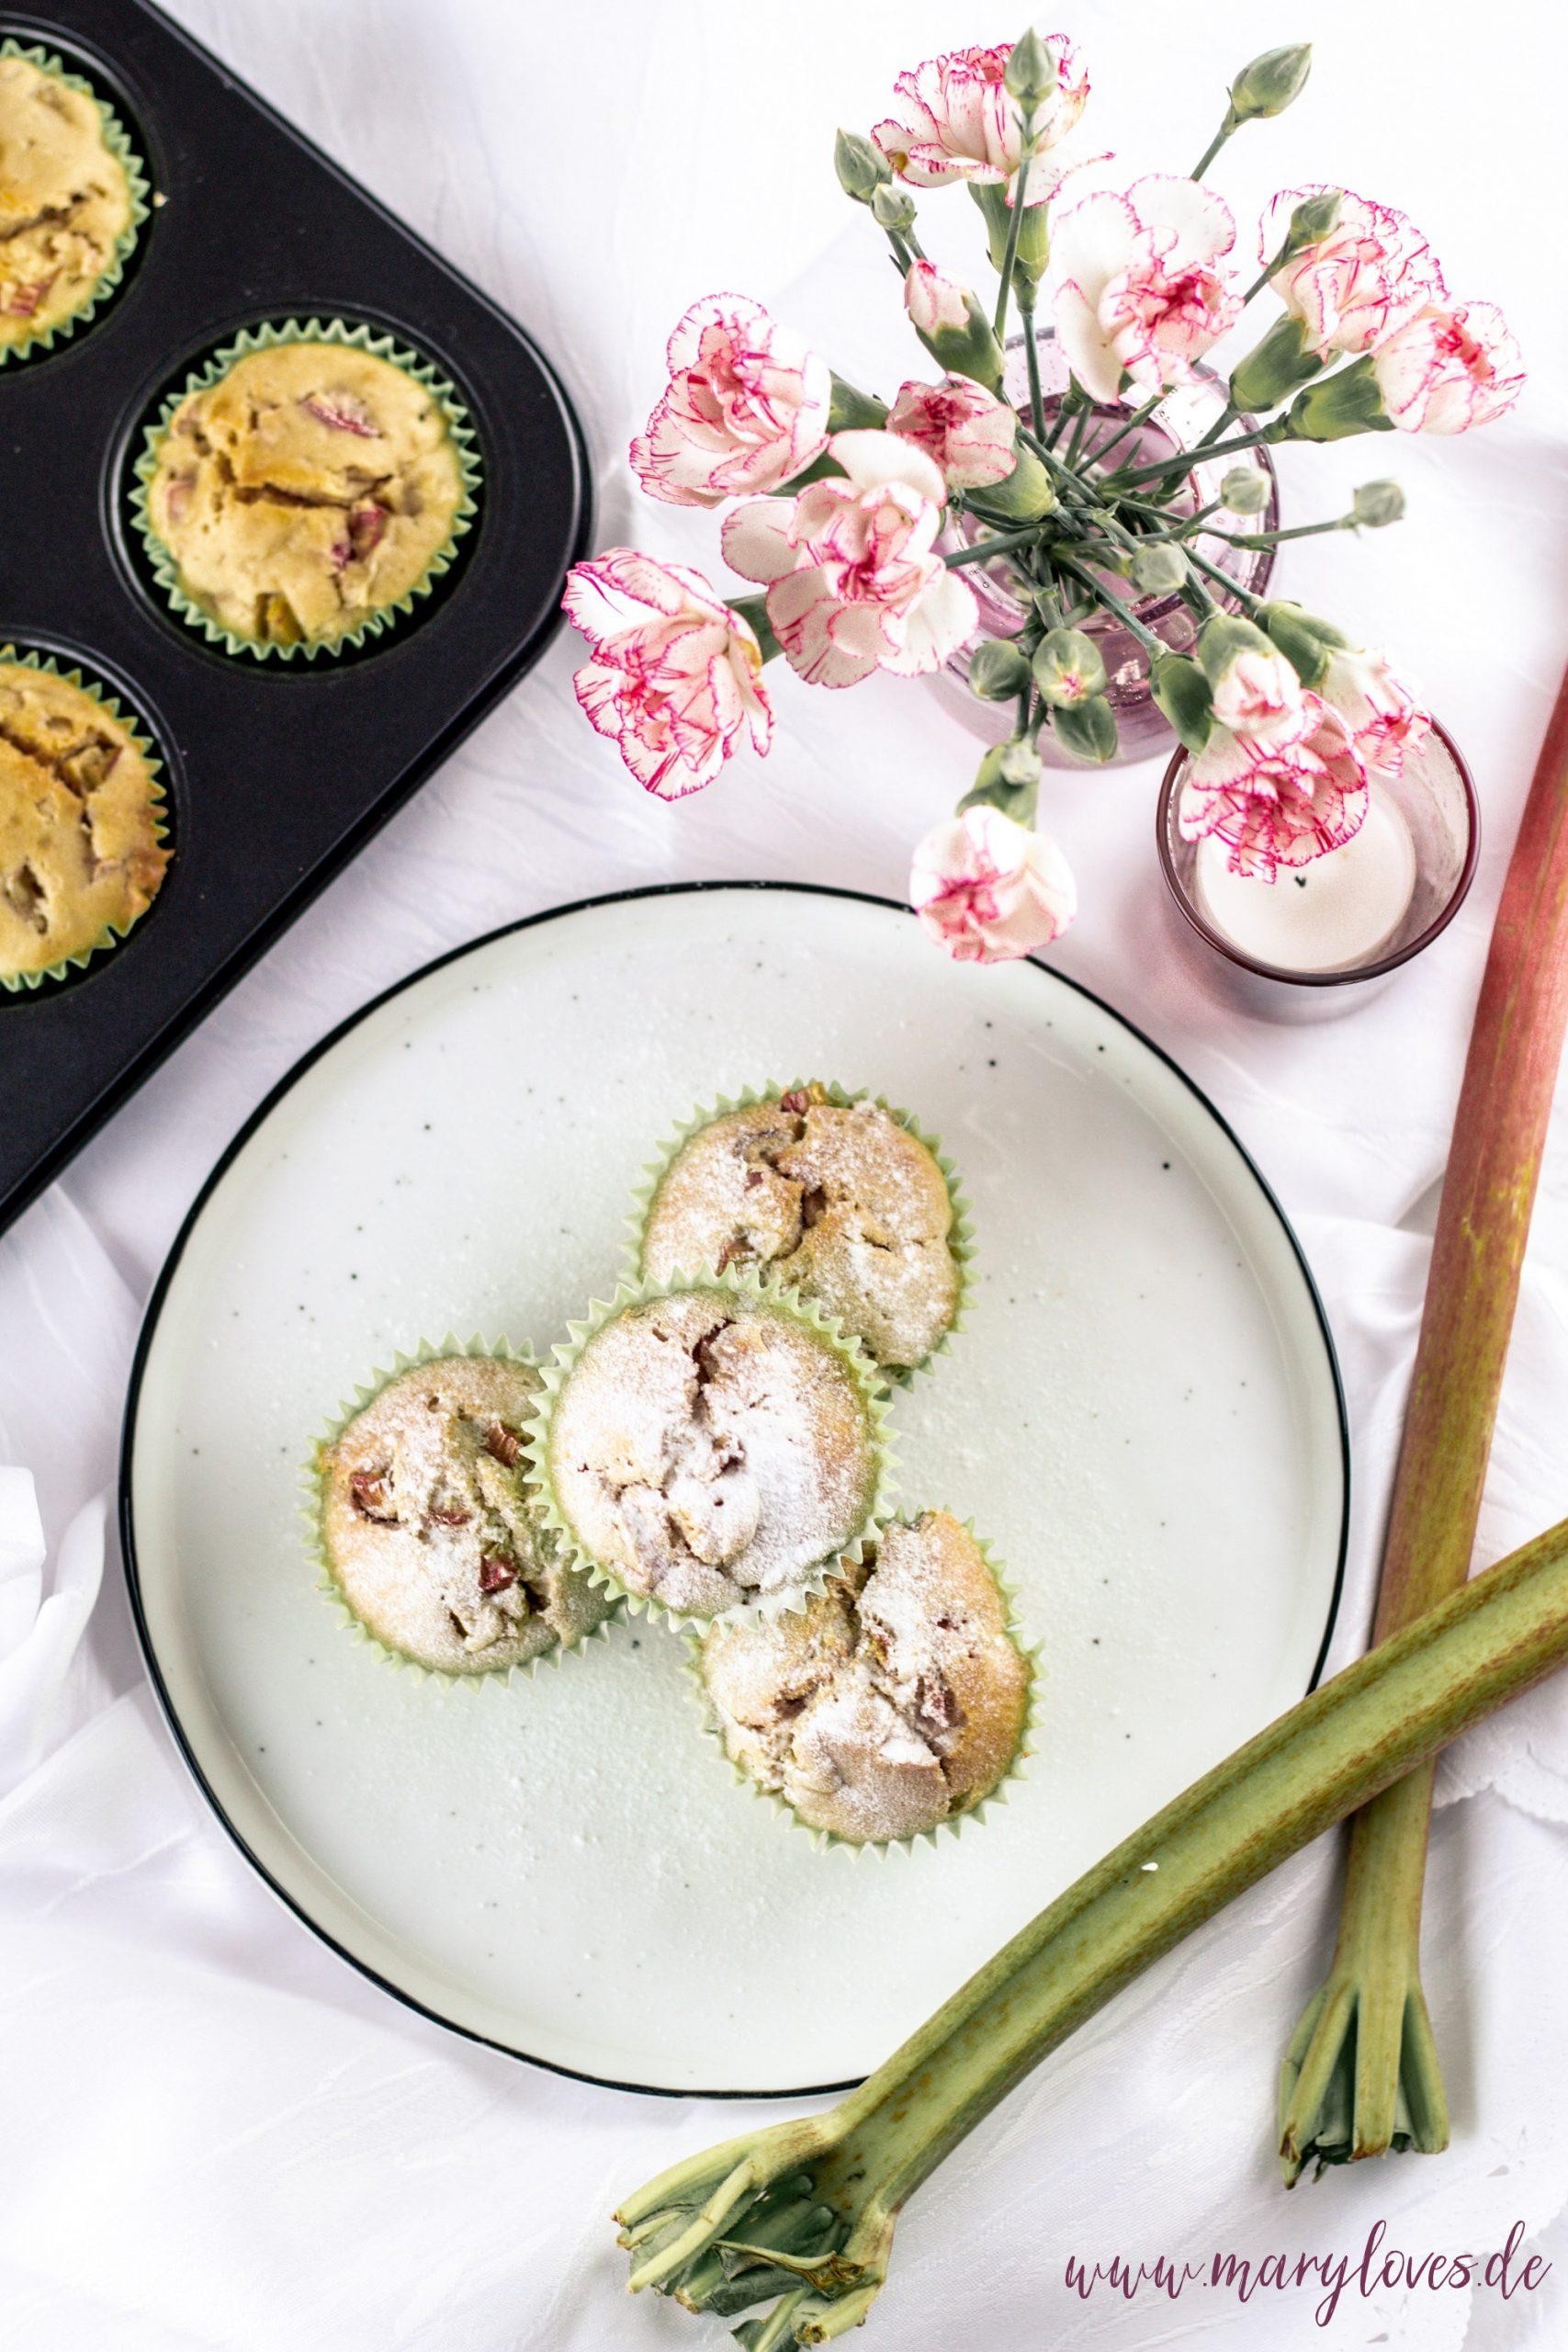 Süße Frühlingssaison mit lecker-leichten Rhabarber-Kokos-Muffins